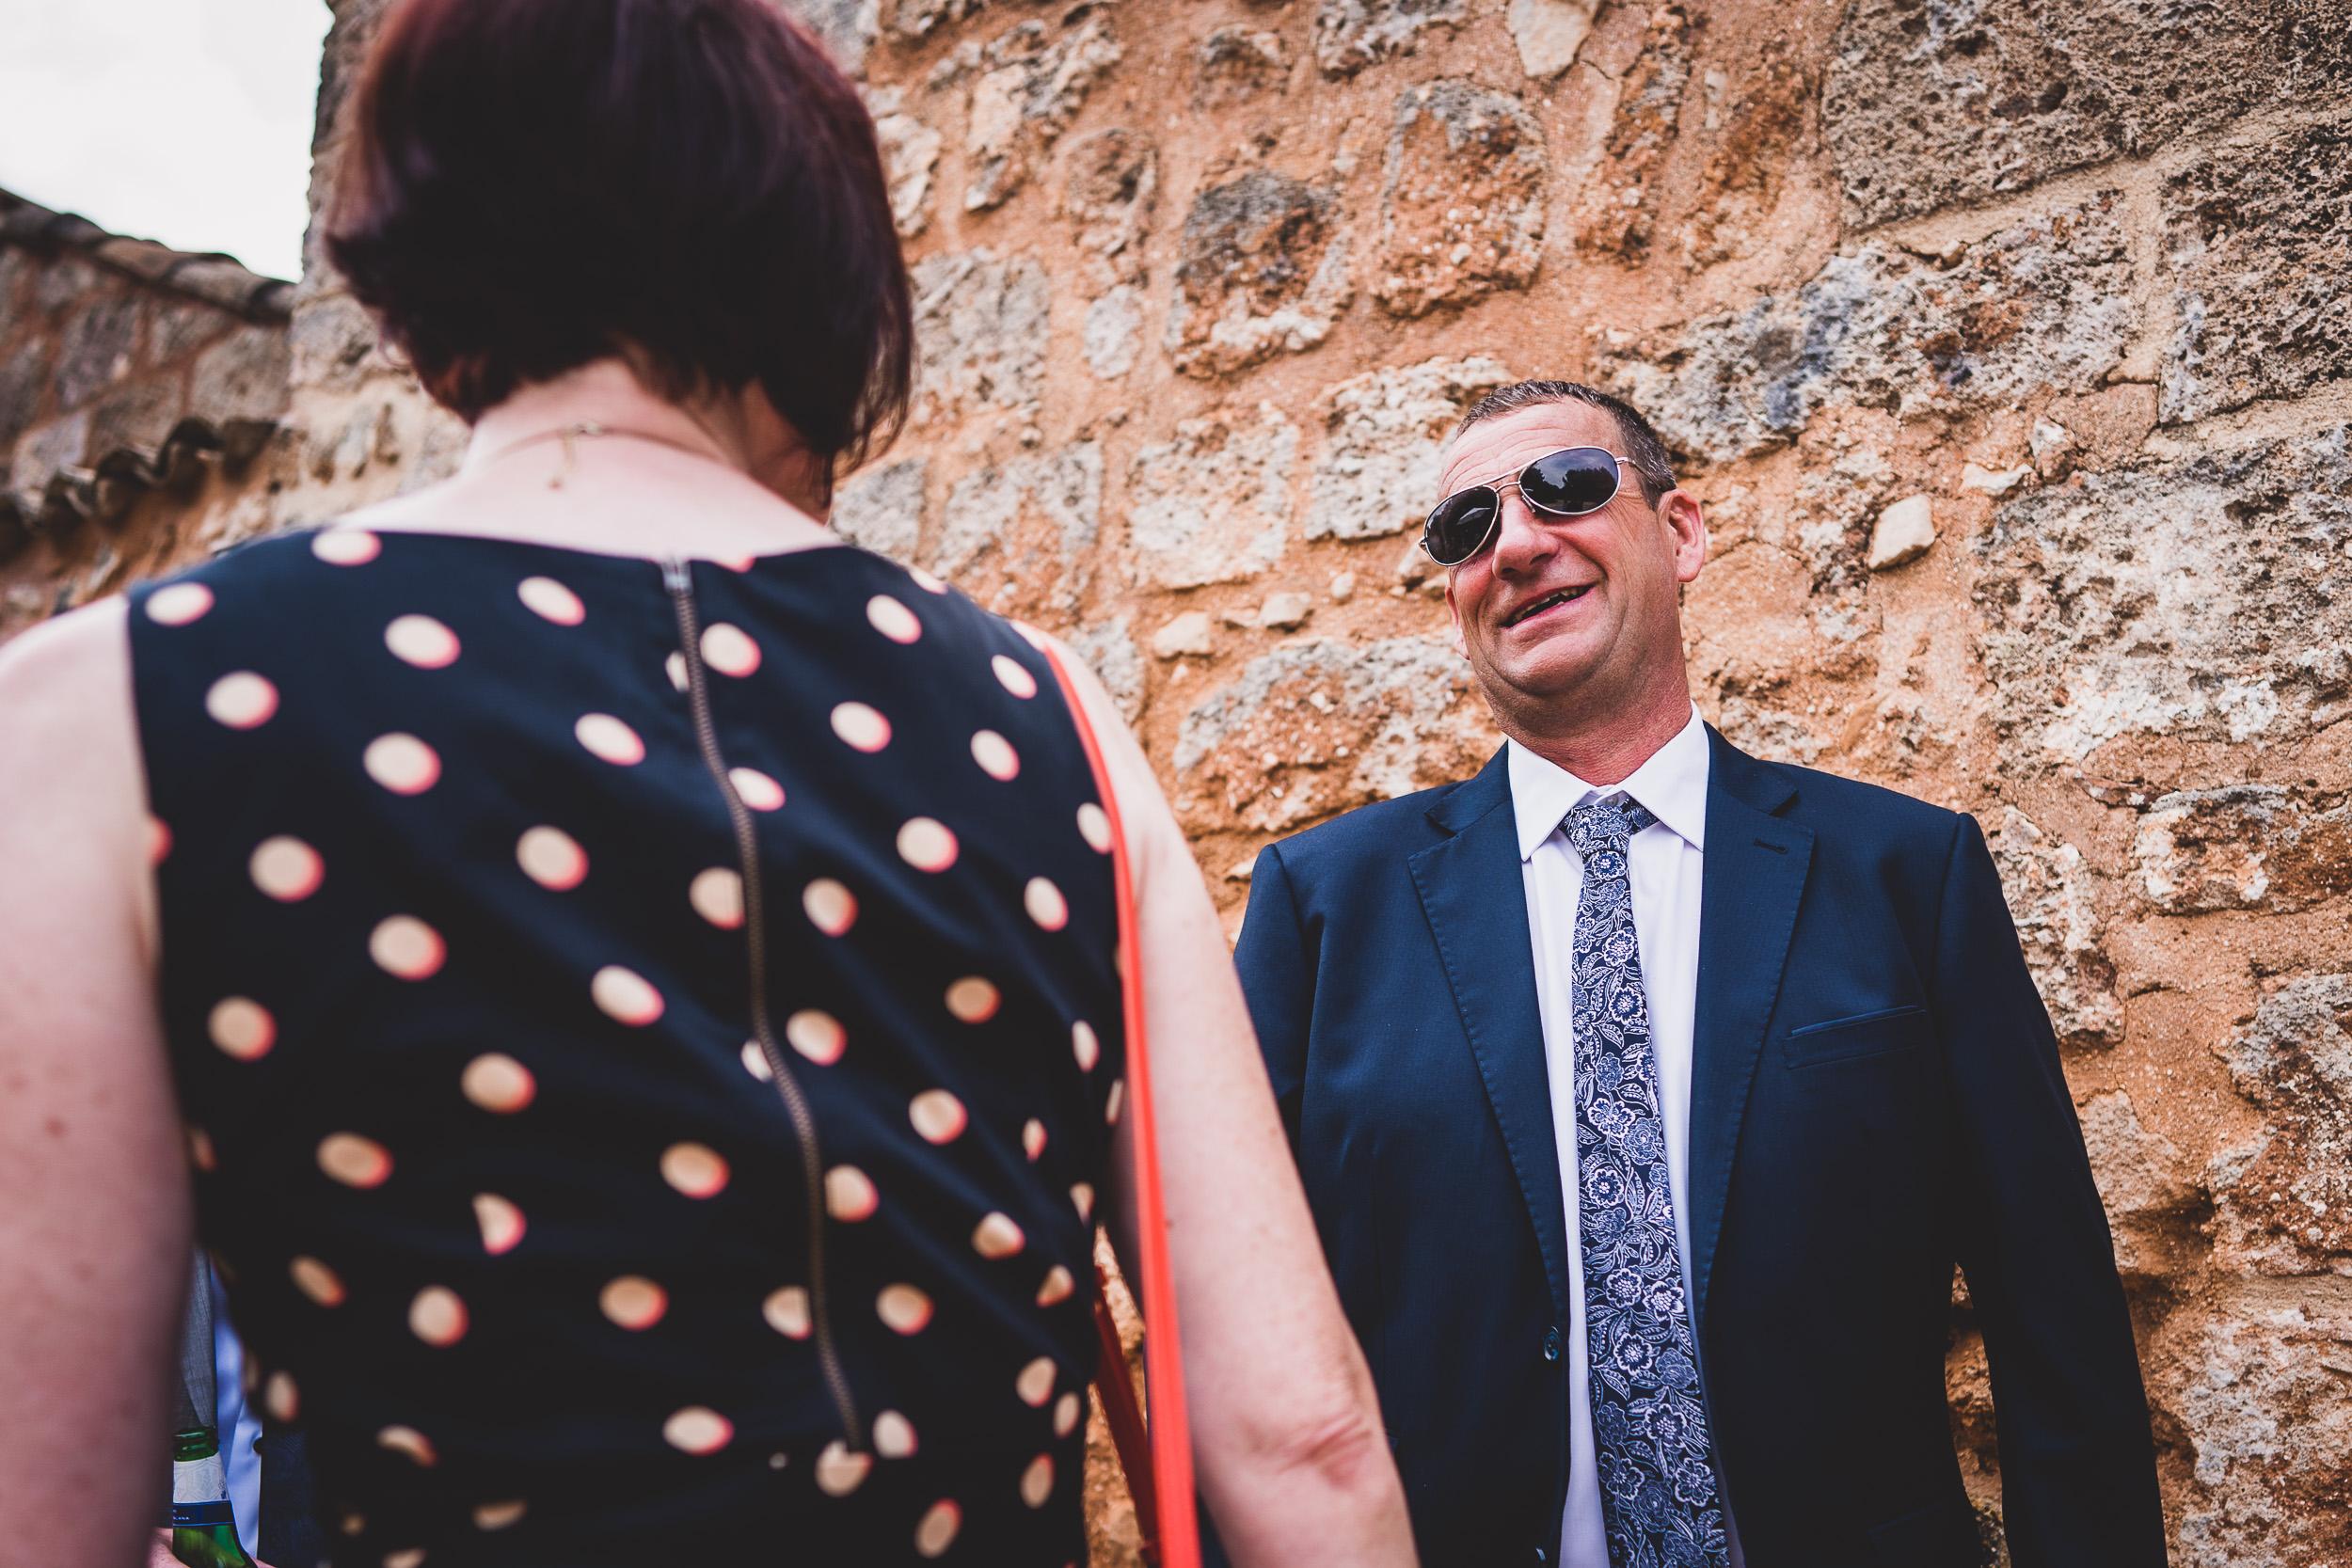 Destination wedding photography | Anna & Nigel destination wedding photography 018